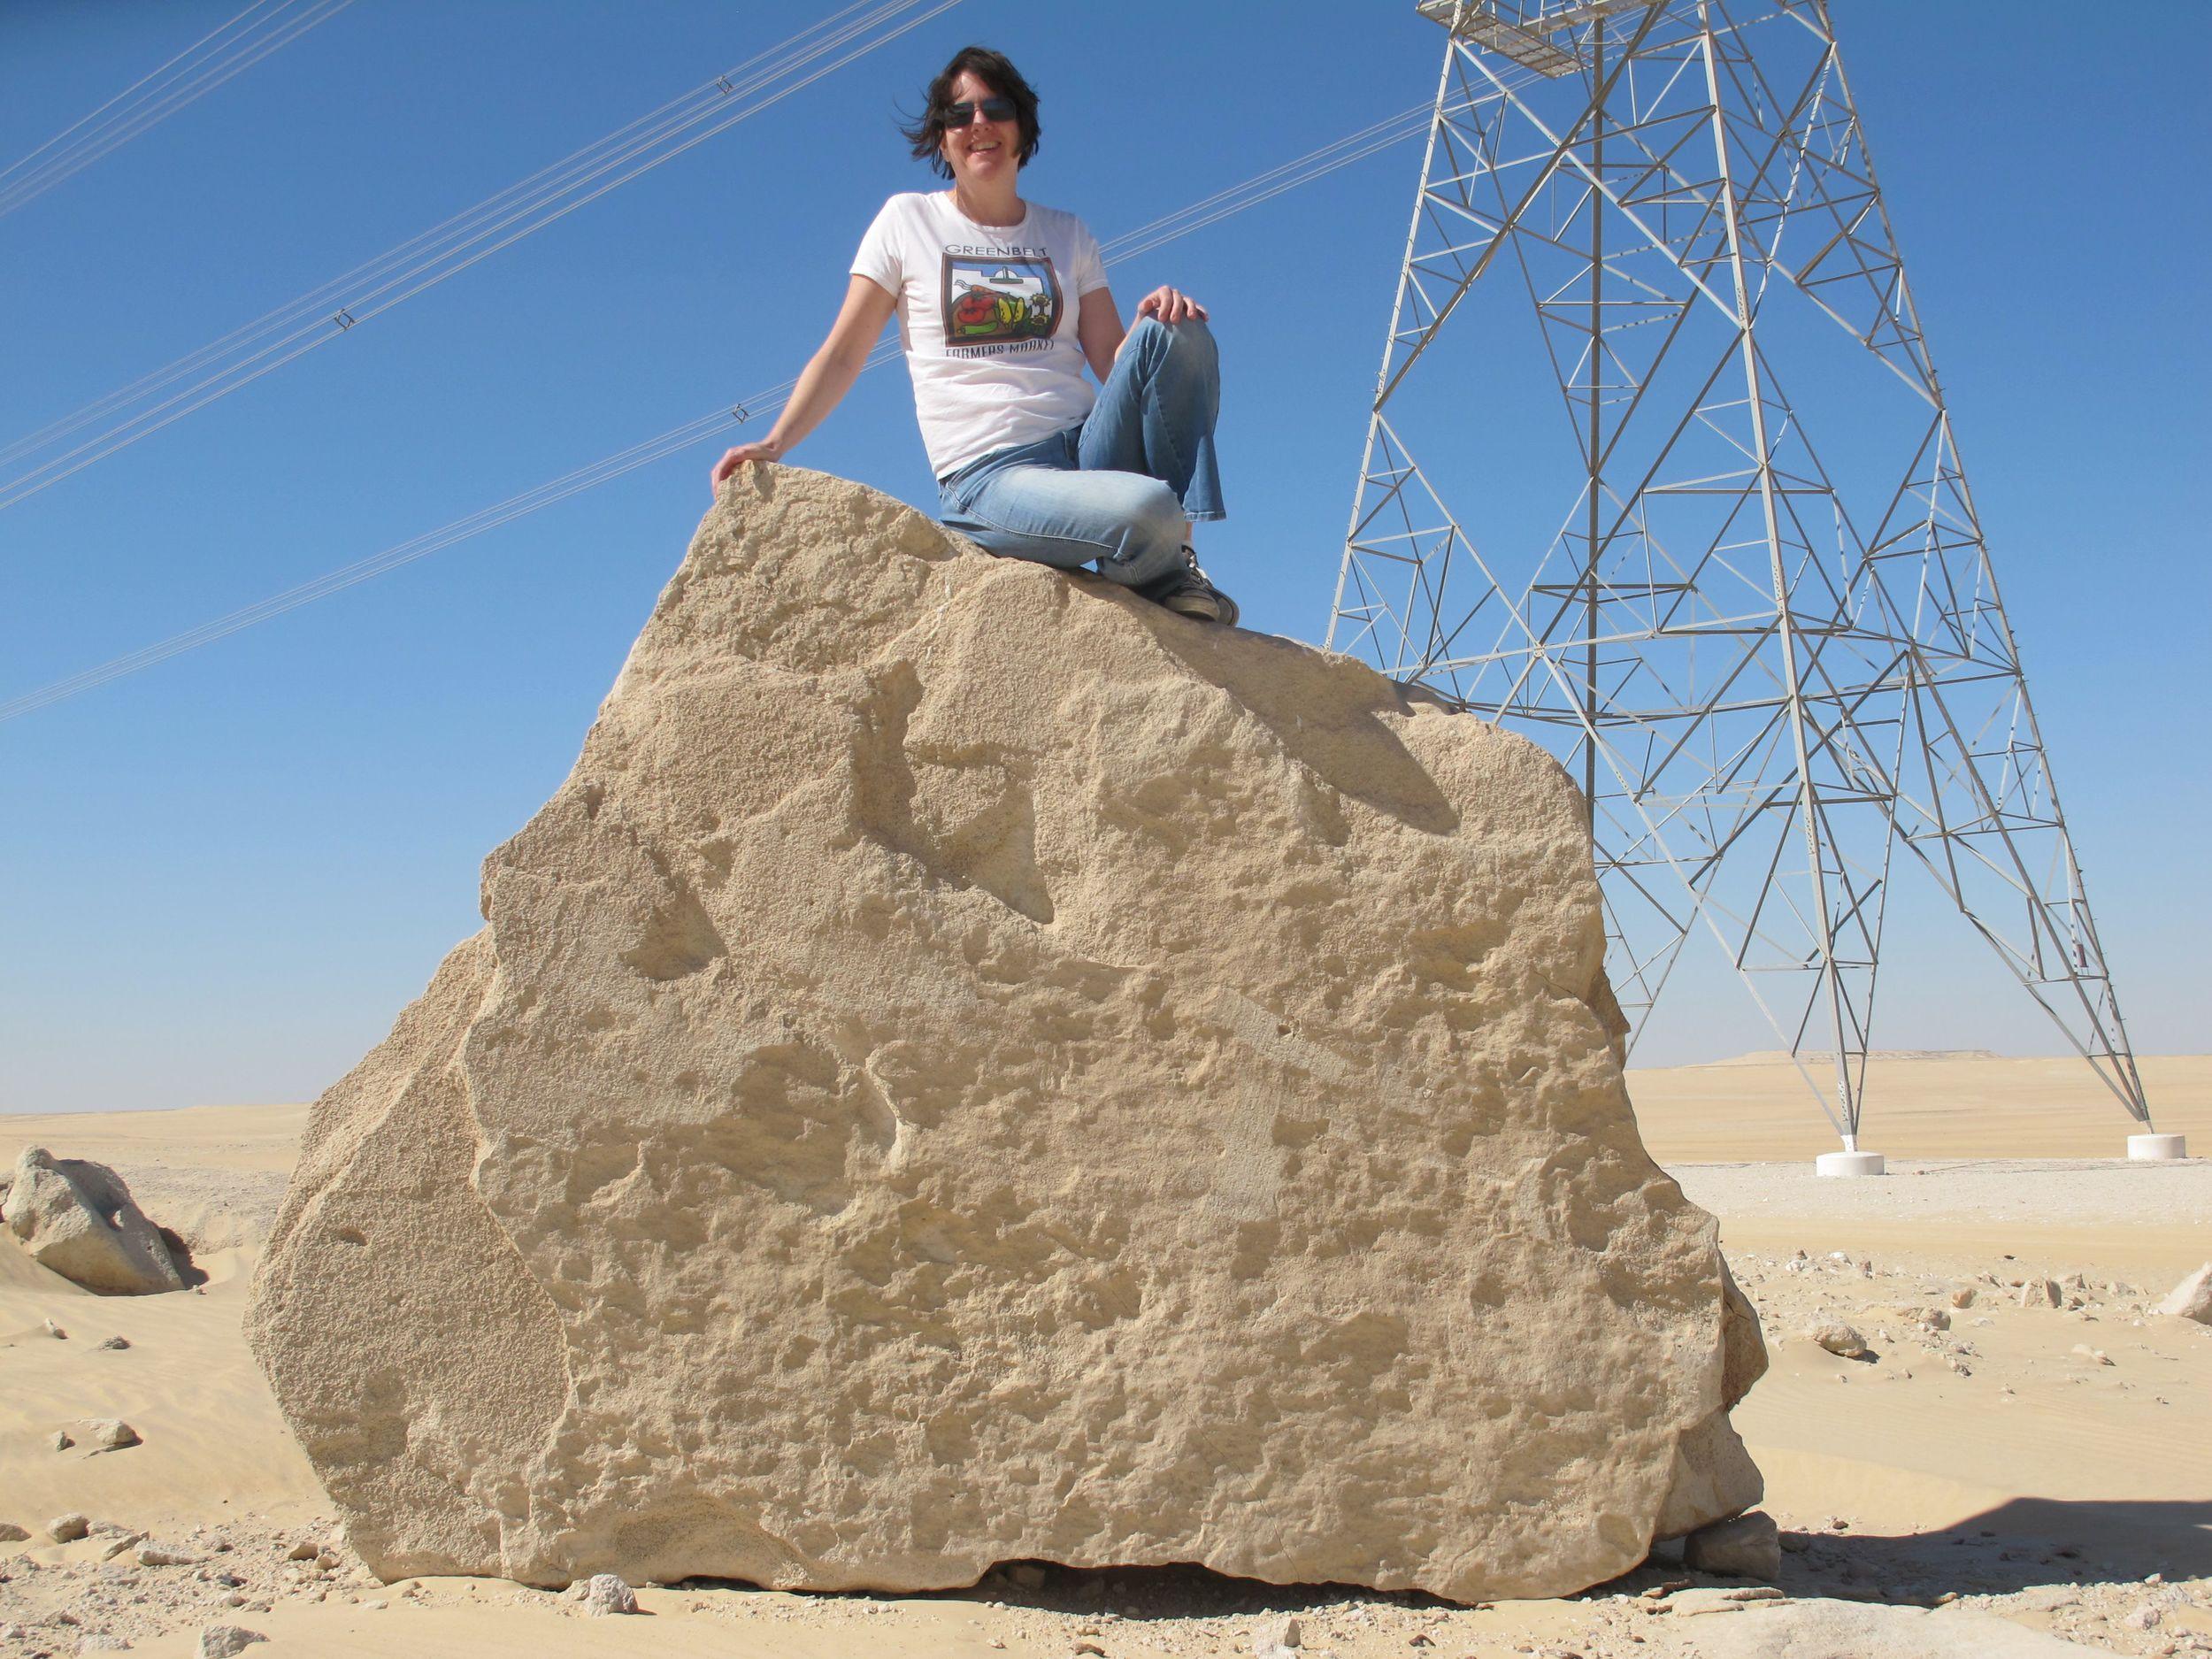 Sporting a Greenbelt Farmers Market t-shirt in the Northern Saudi desert